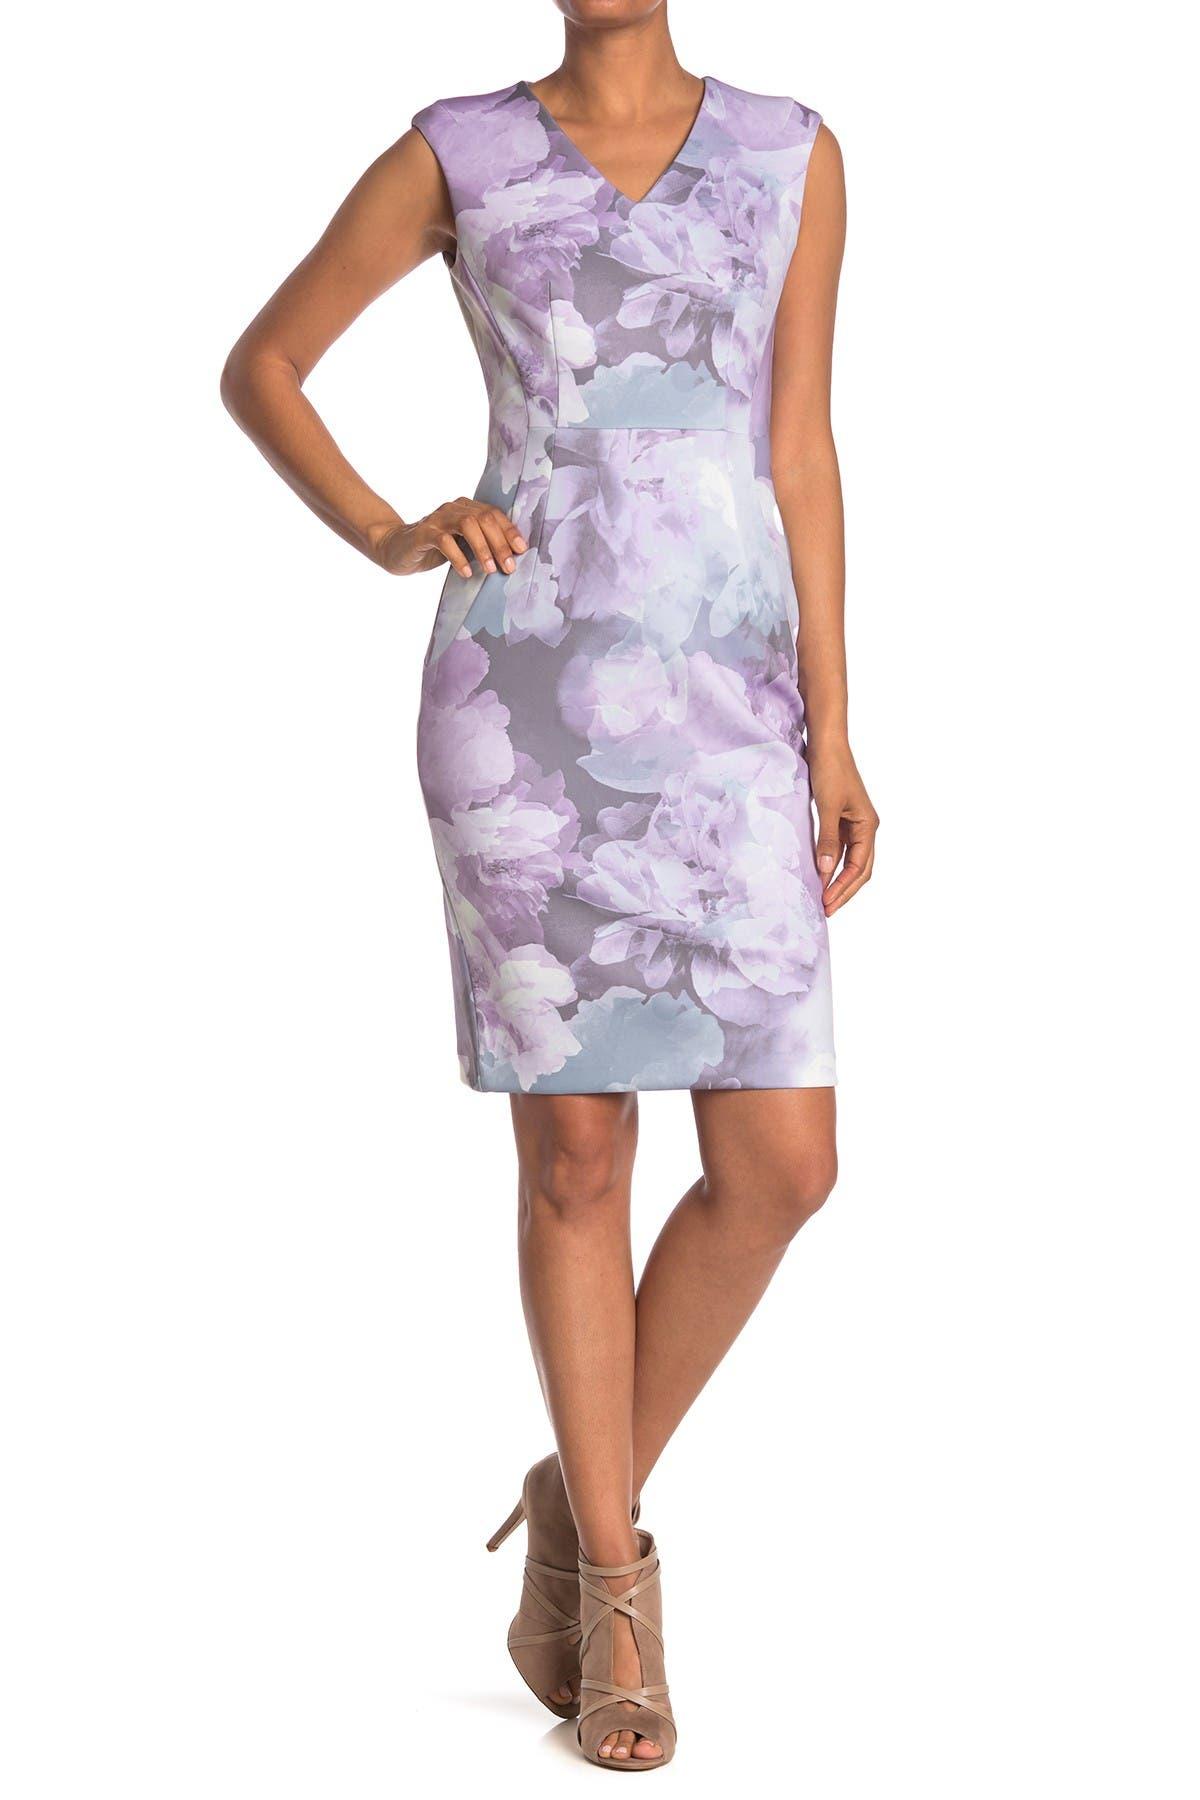 Image of Calvin Klein Watercolor Floral Sheath Dress